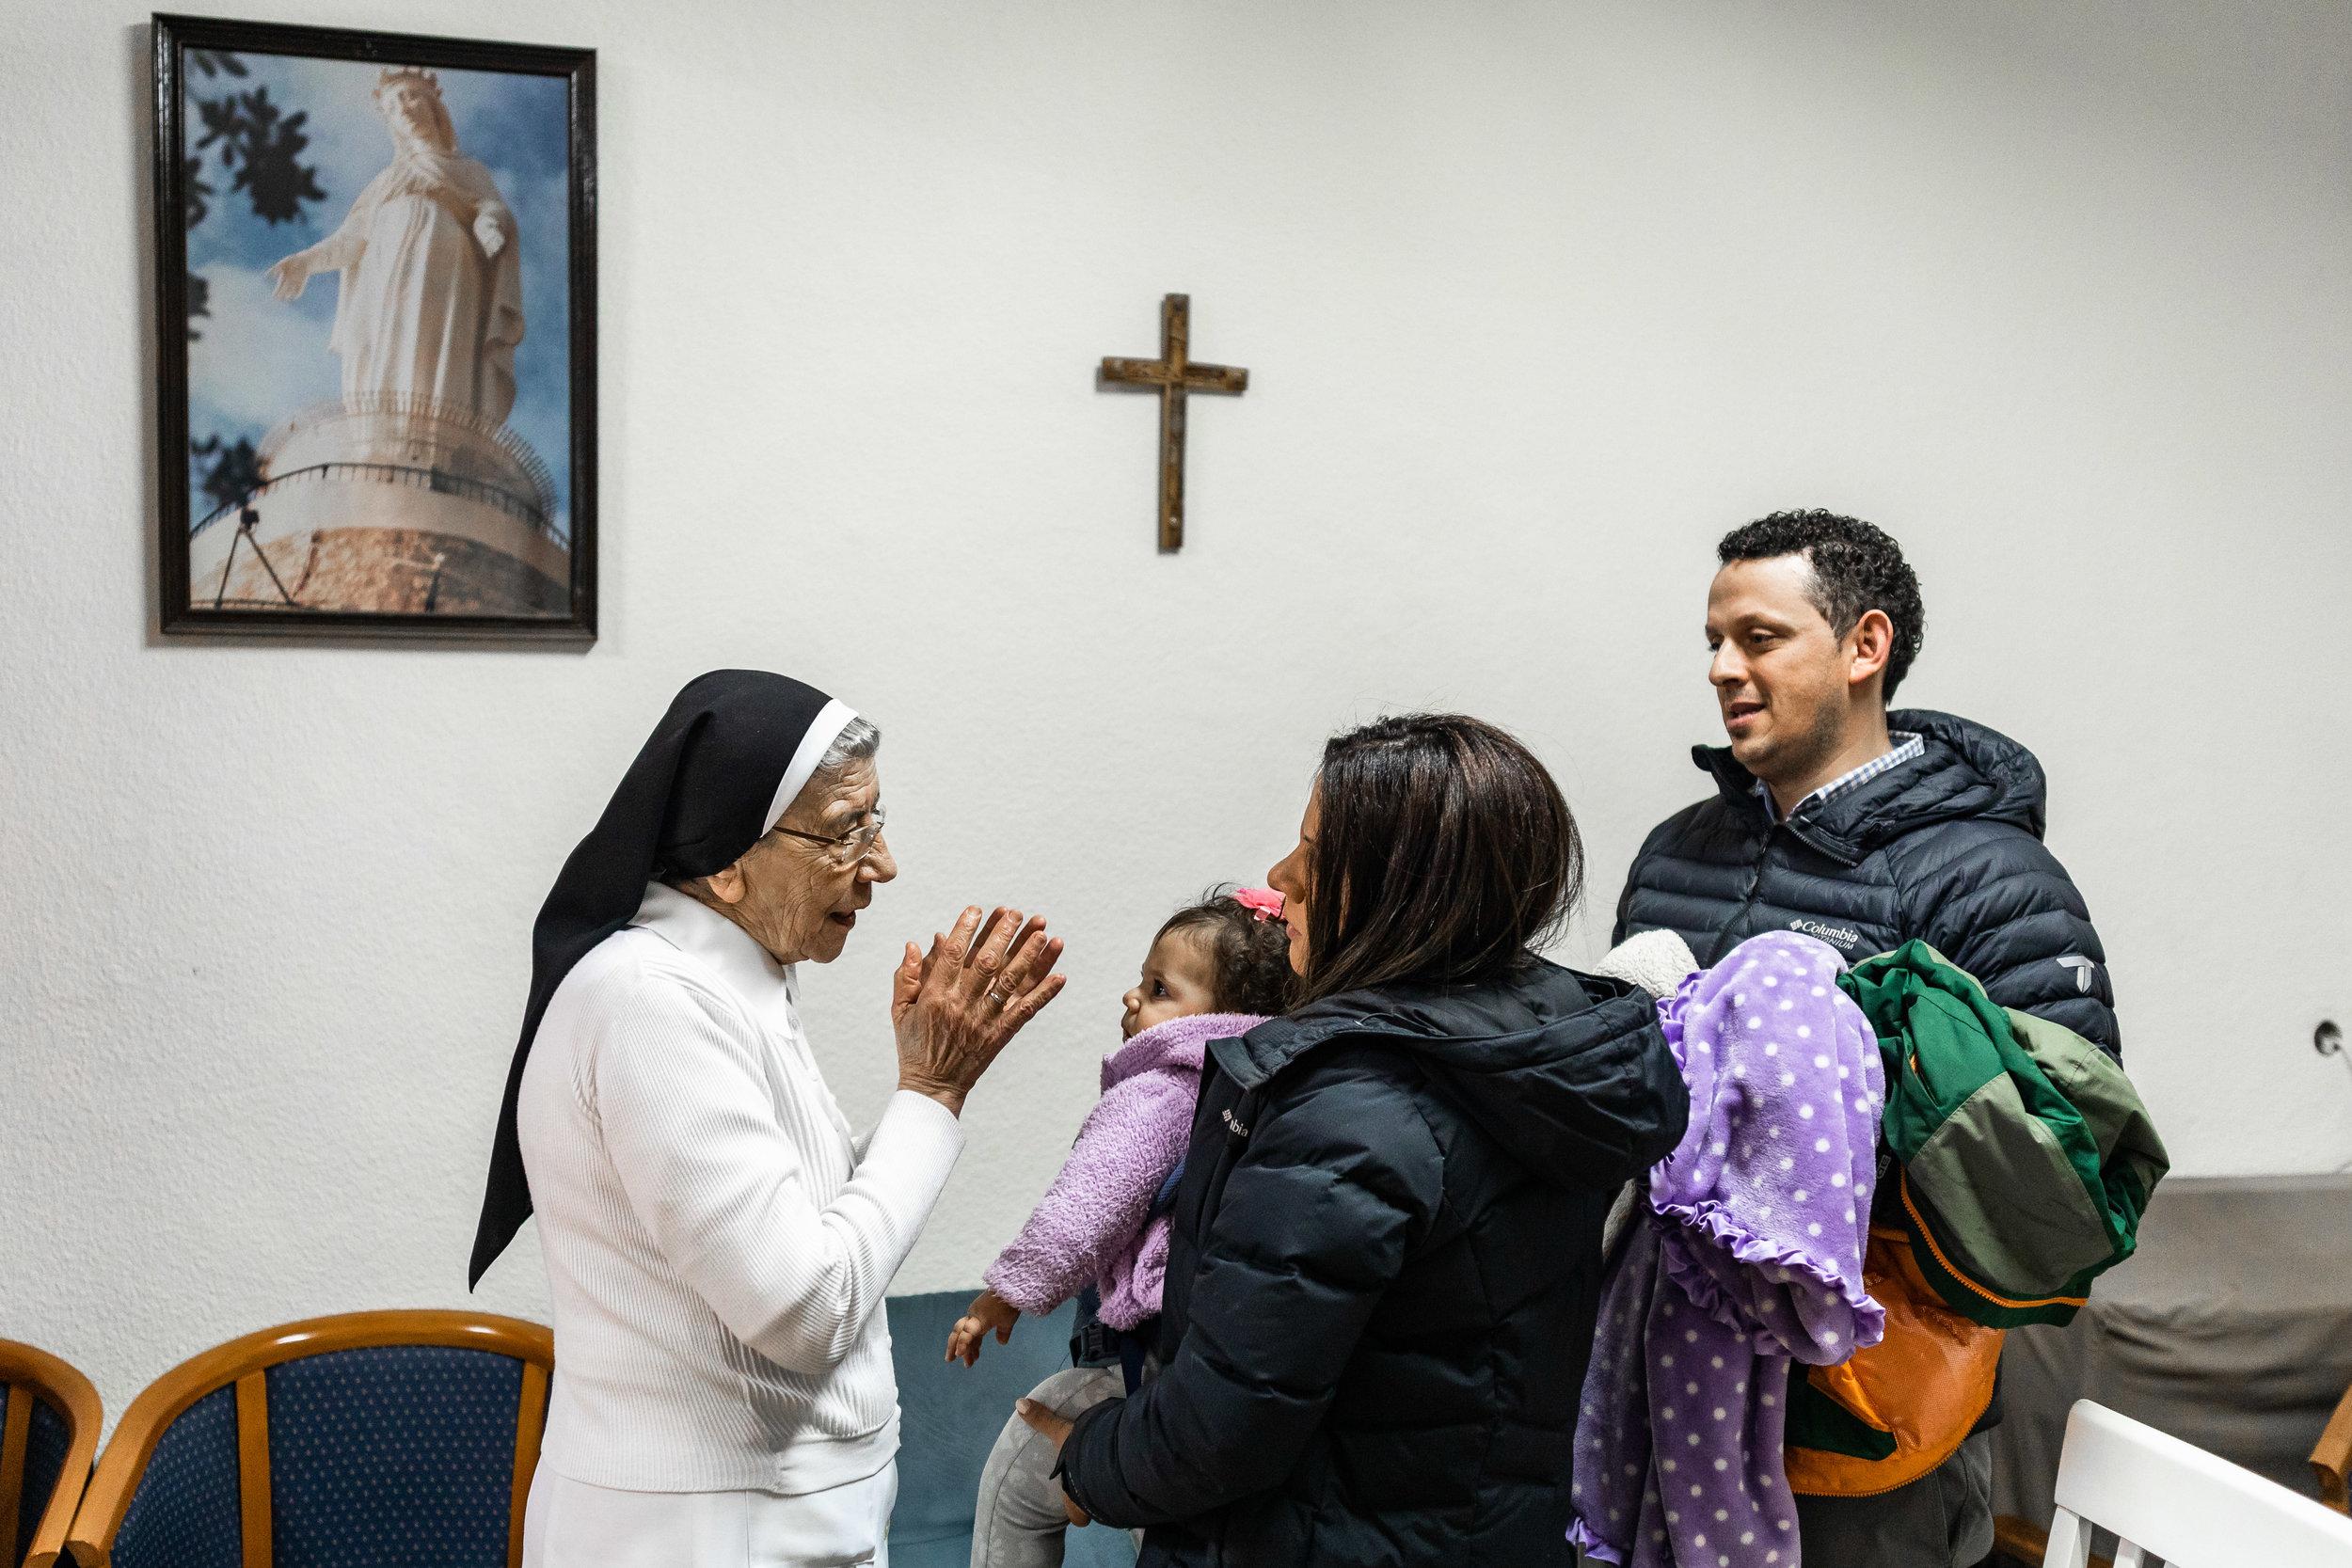 Momenti - Inside Jerusalems Churches — Sebi Berens